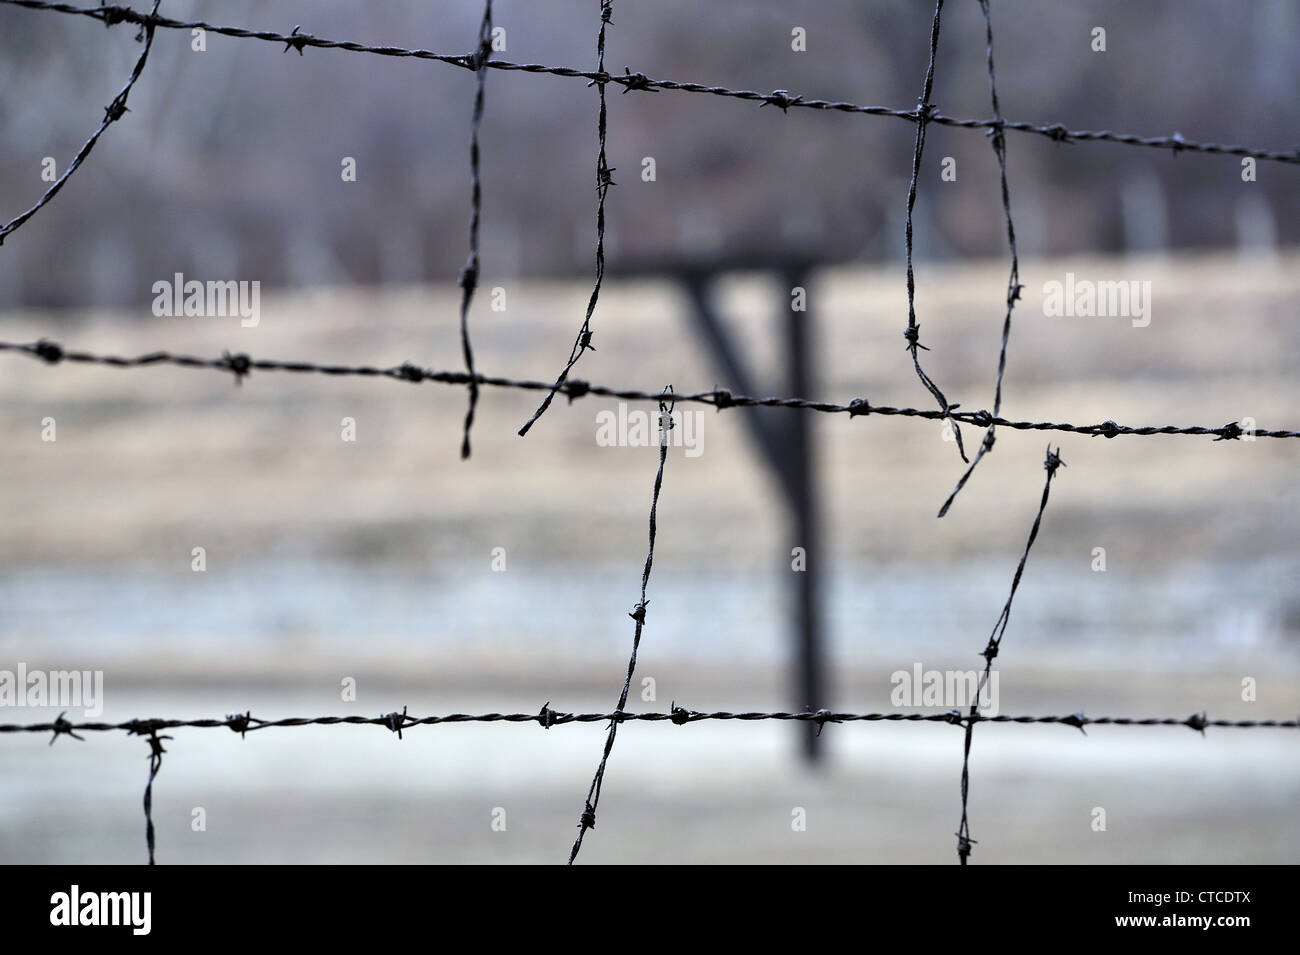 German Nazi concentration camp, extermination in occupied Poland, Hitler concentration camp, extermination camp - Stock Image